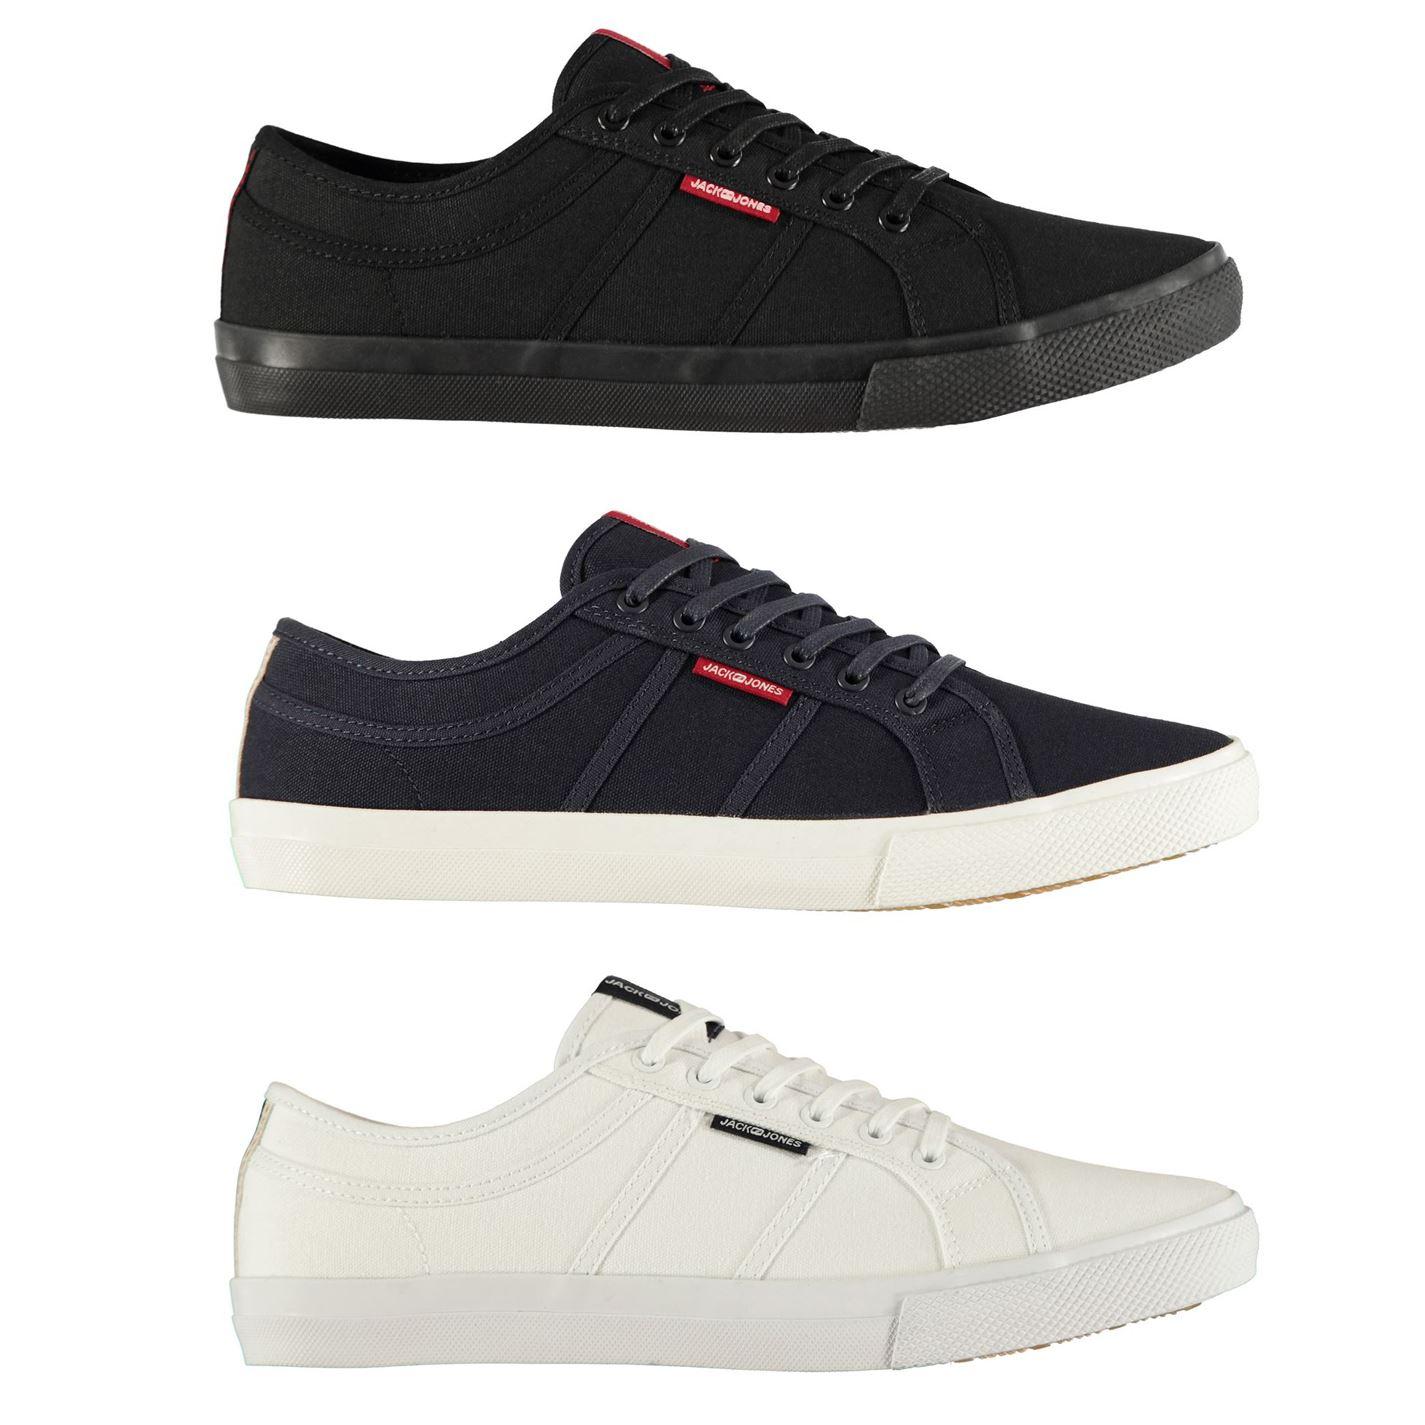 jack and jones canvas shoes